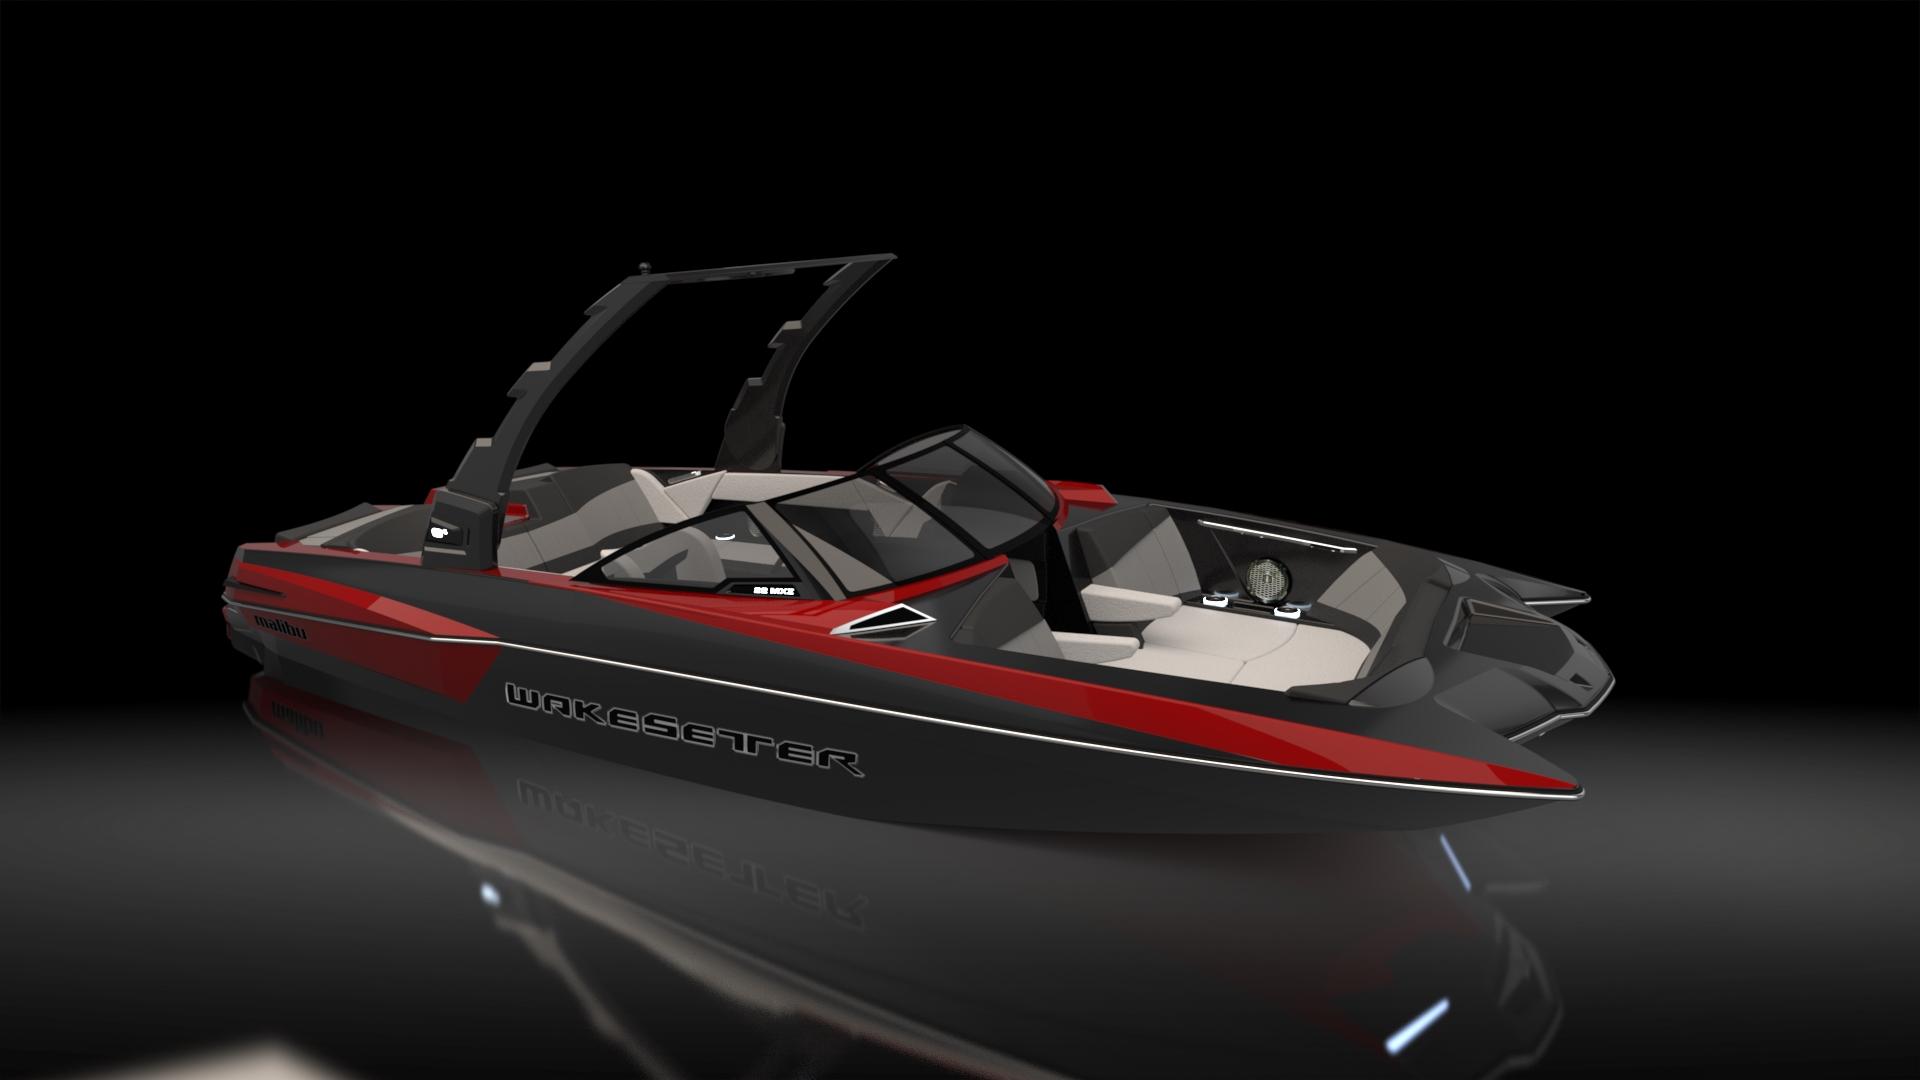 Malibu MXZ Concept